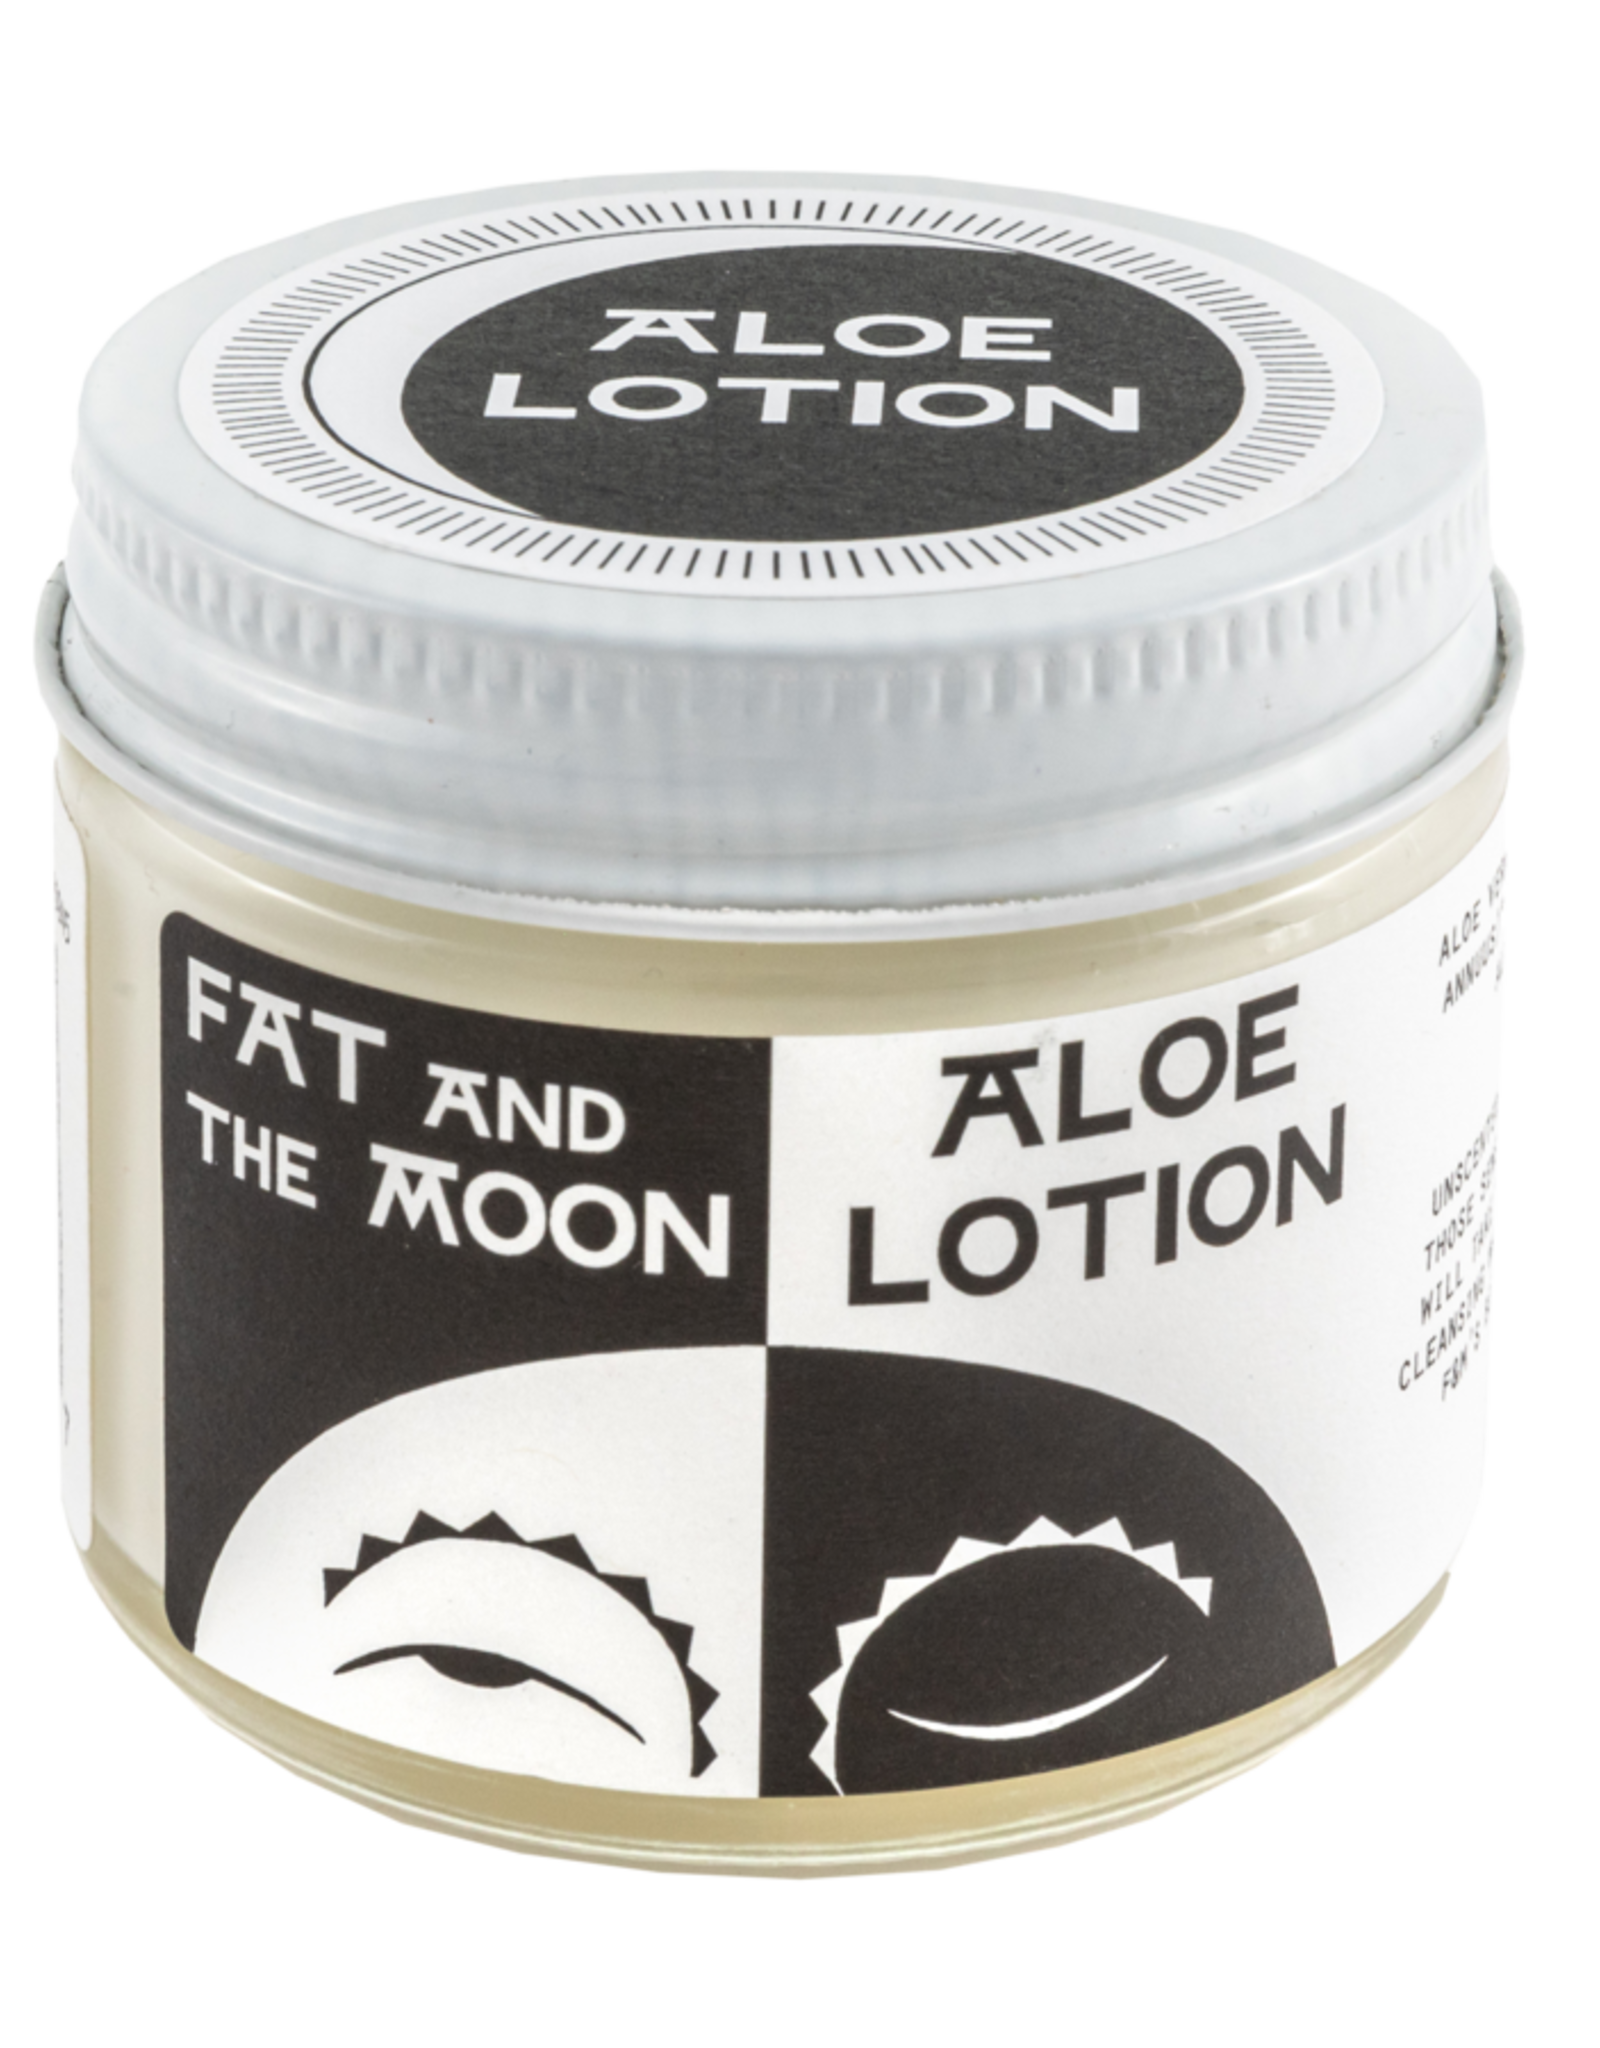 Aloe Lotion 2oz